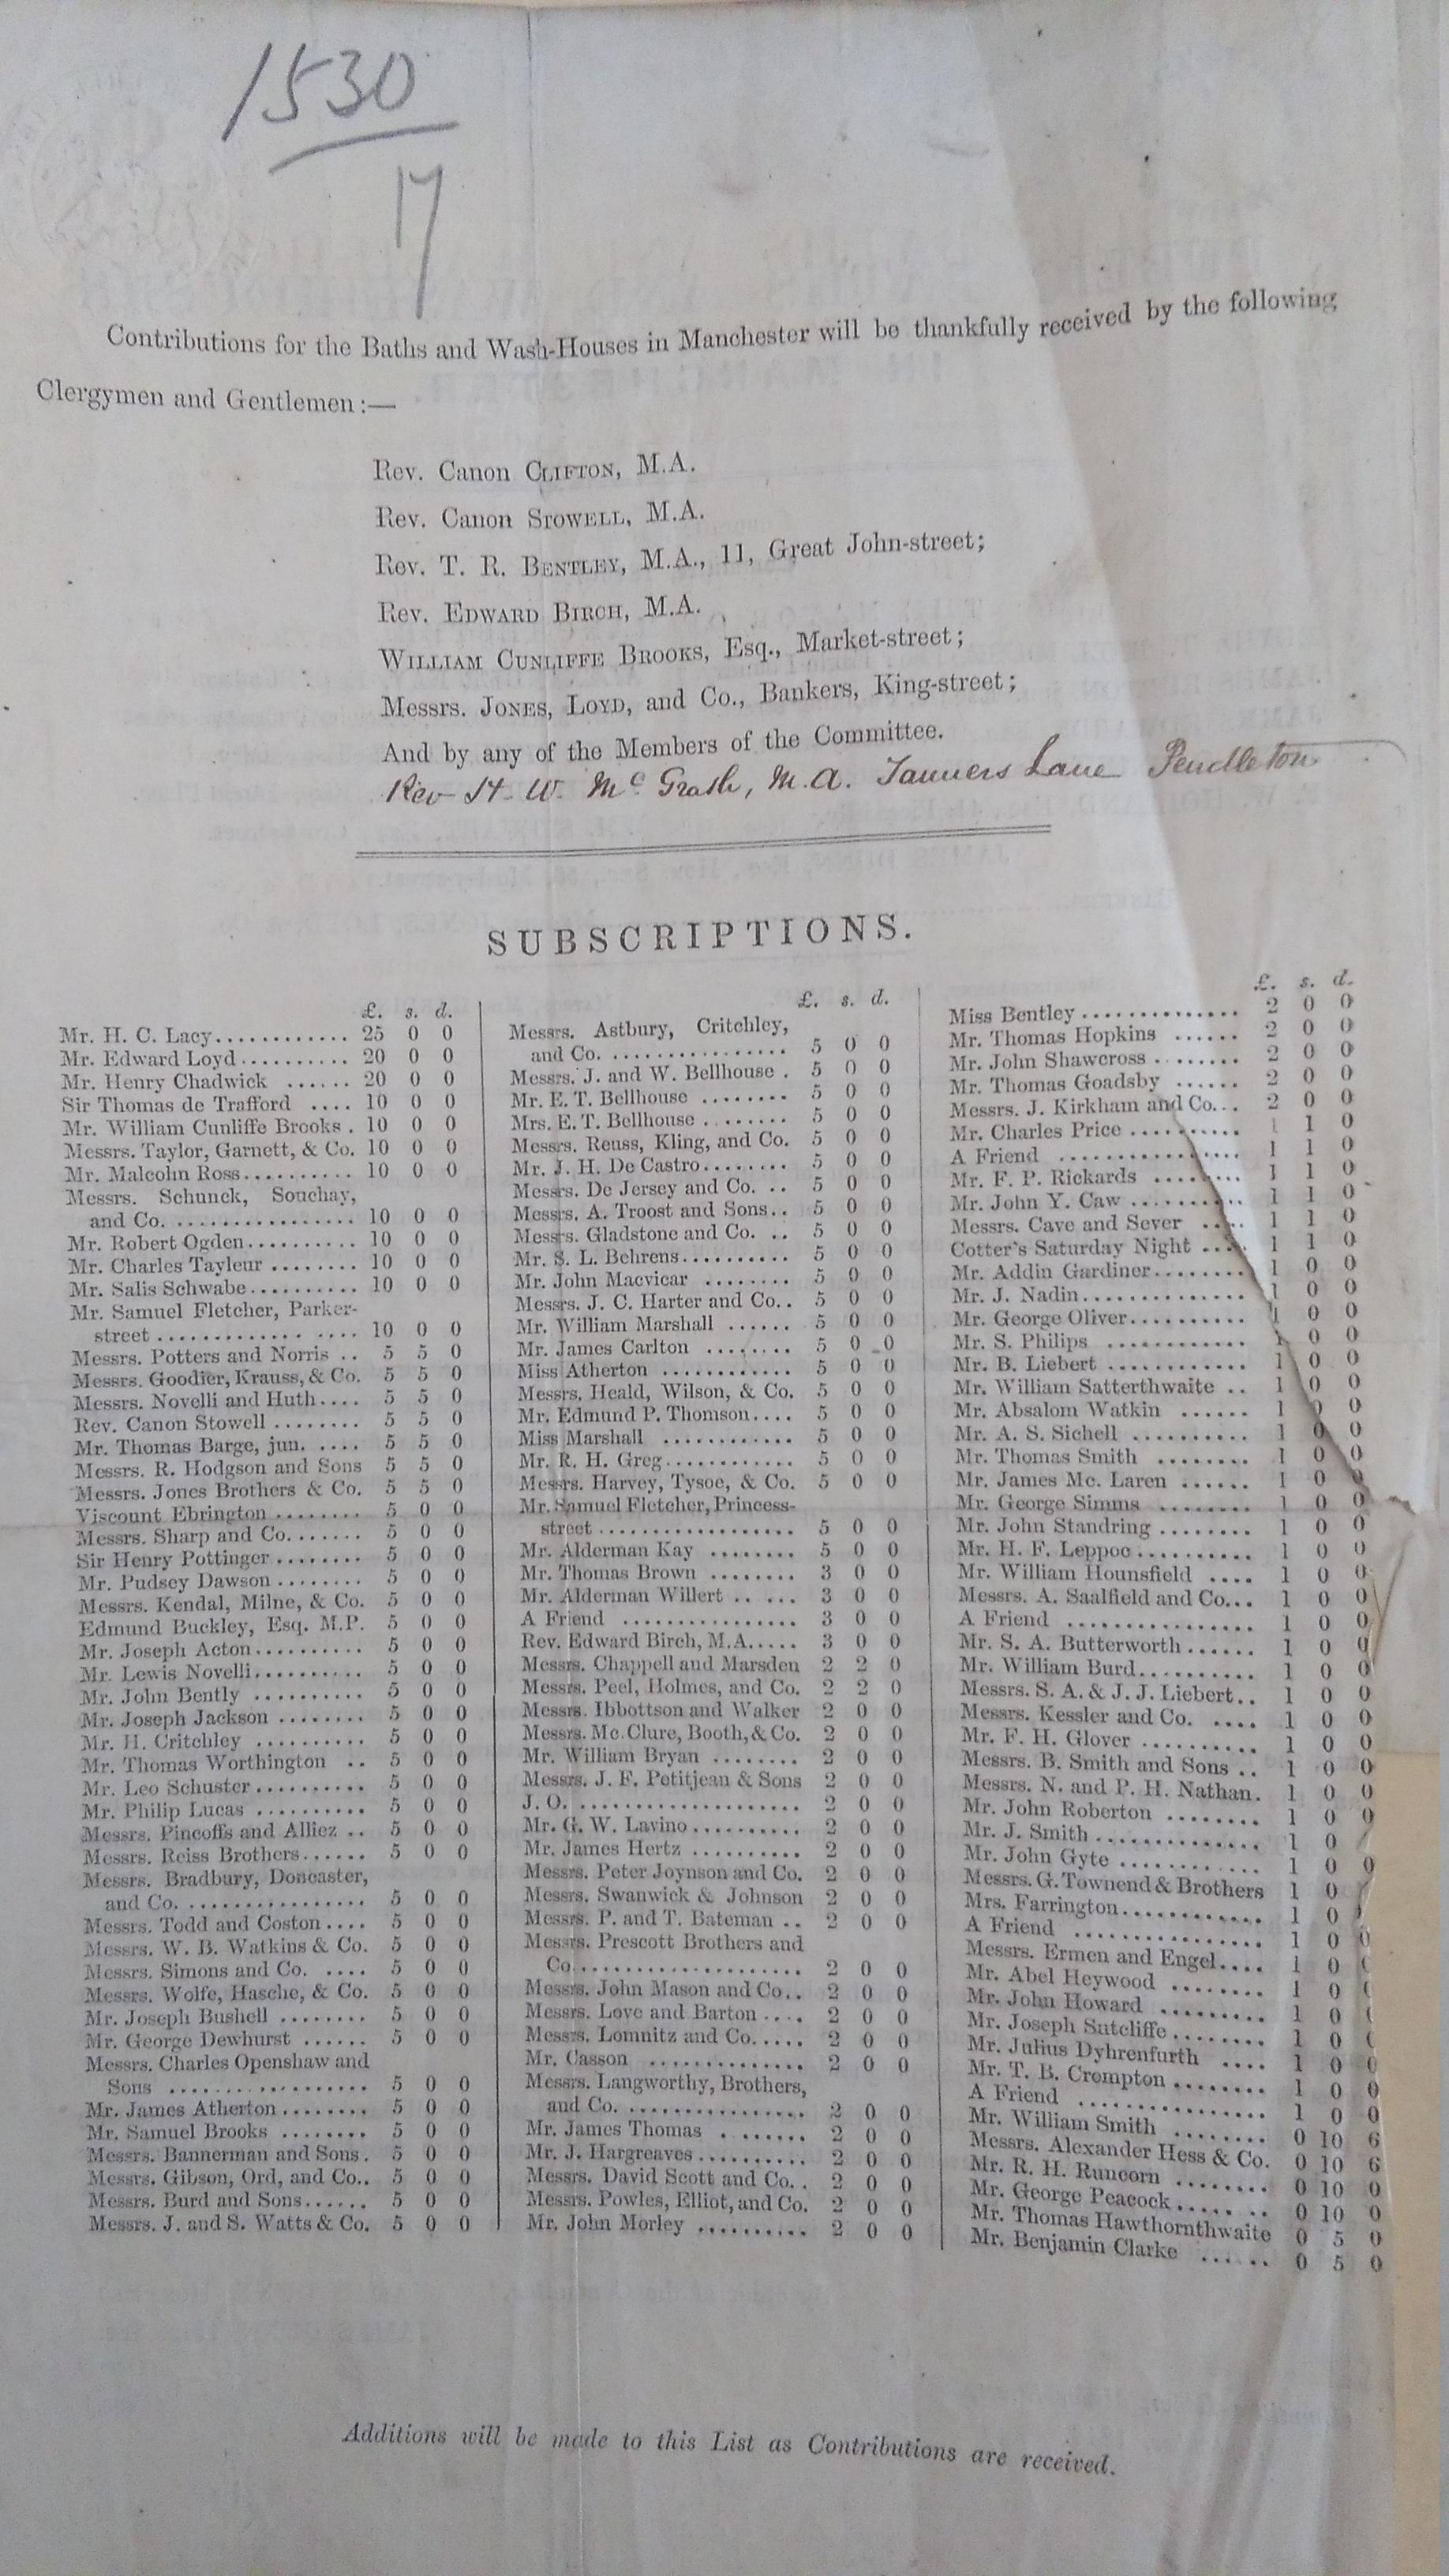 Miller Street baths subscription list